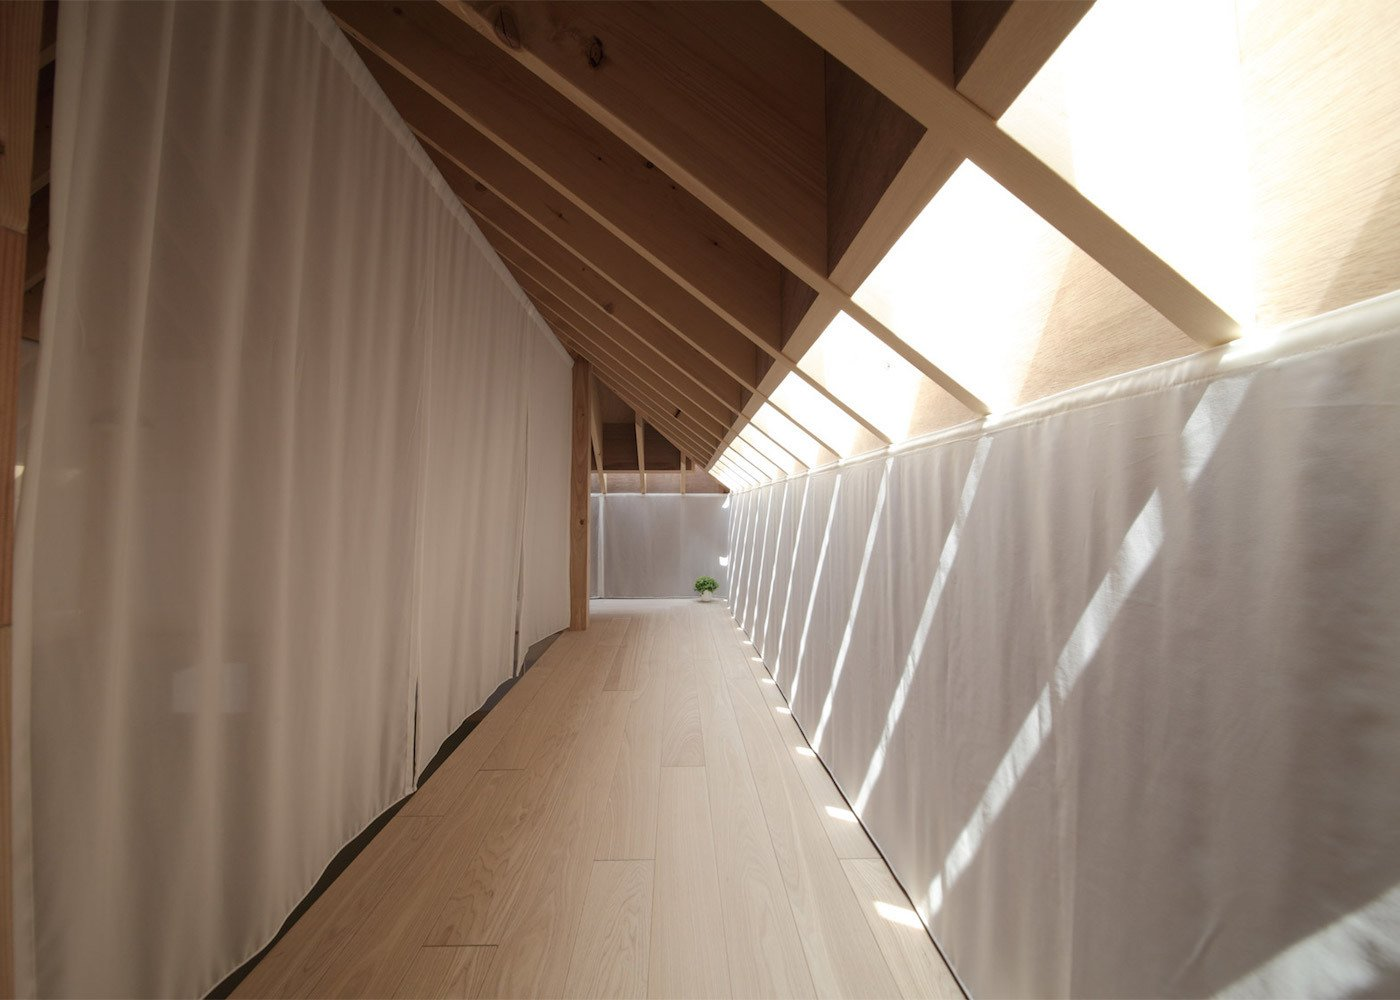 Photo 1 of 4 in Wengawa House by Katsutoshi Sasaki + Associates